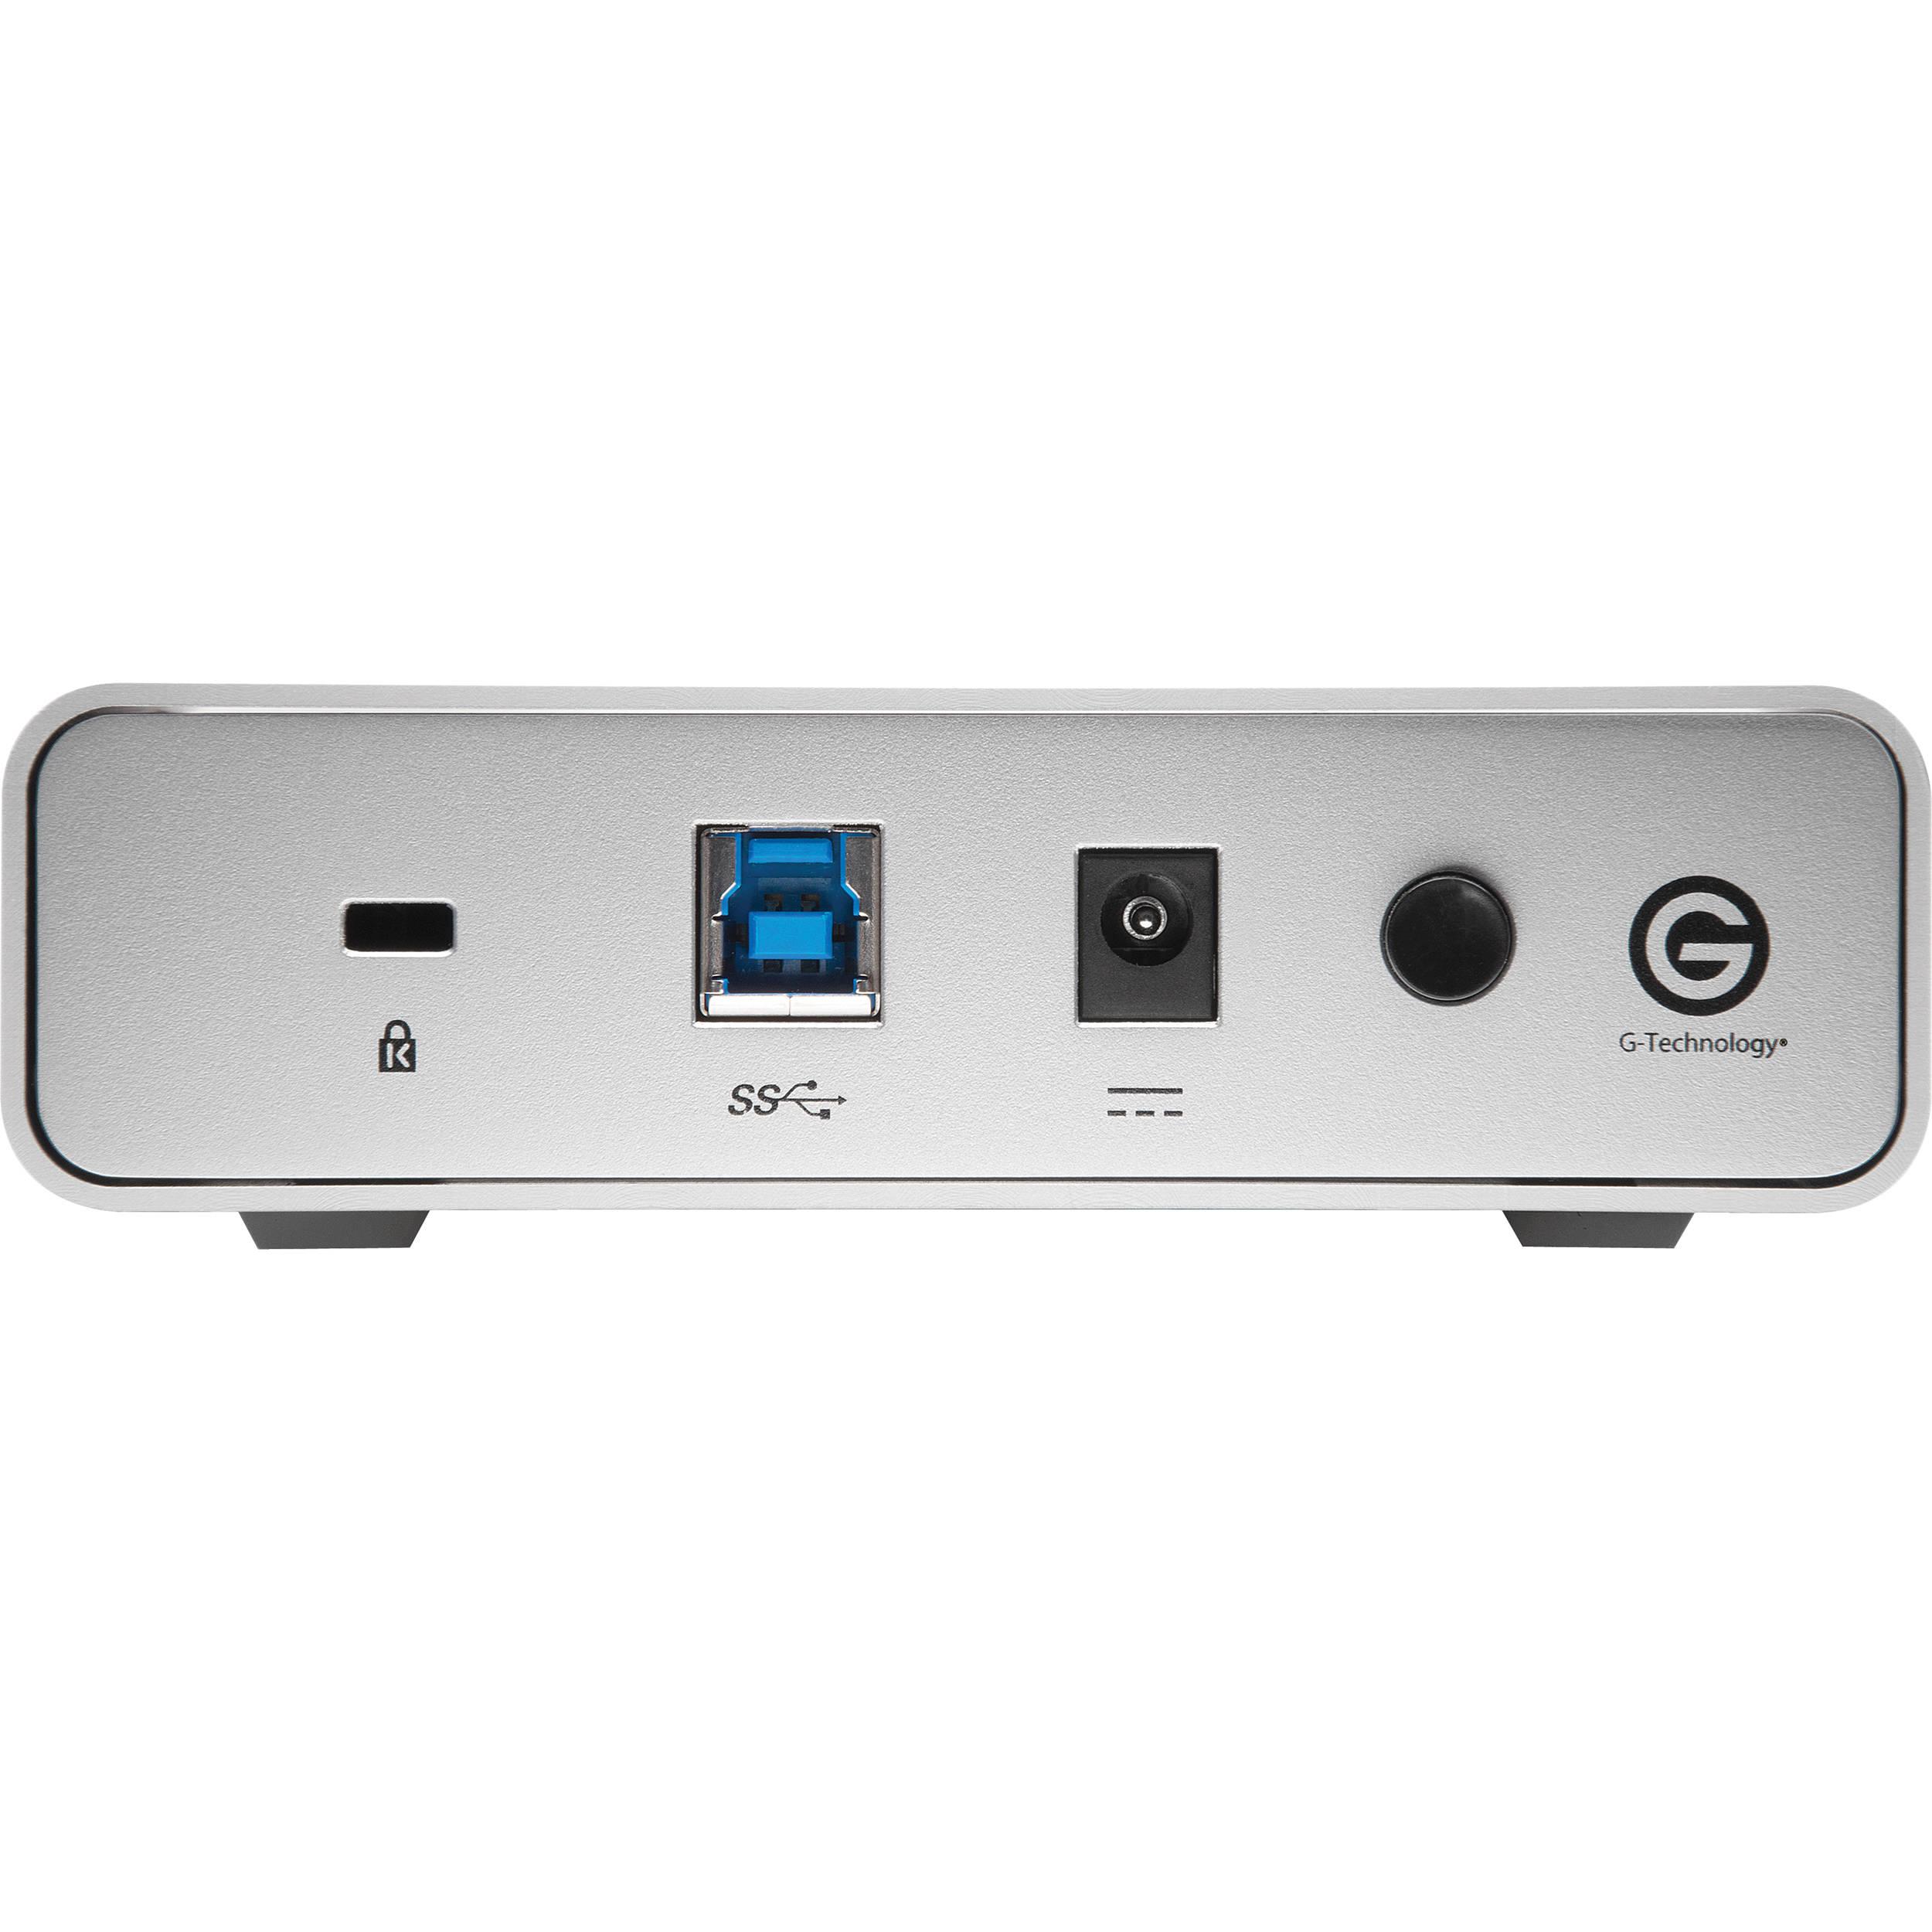 G-Technology 6TB G-DRIVE USB G1 USB 3 0 Hard Drive